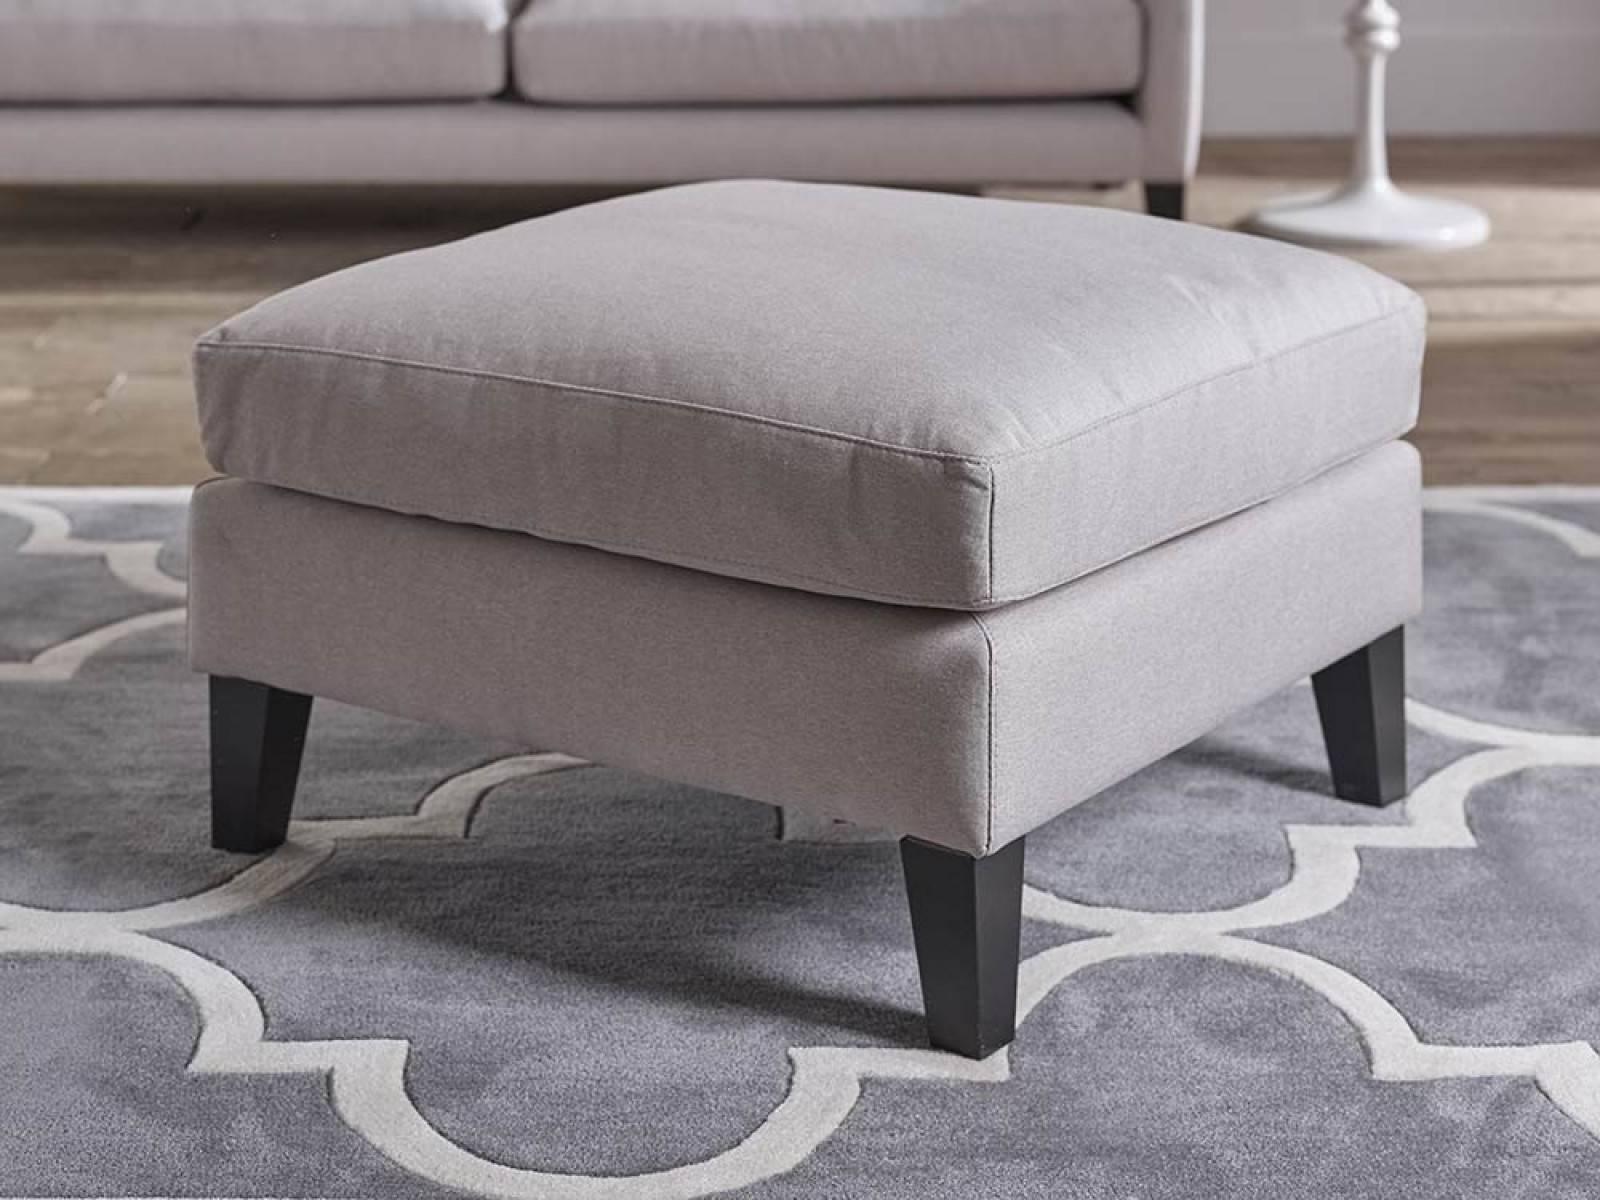 Freya Upholstered Footstool | Living It Up intended for Upholstered Footstools (Image 6 of 30)